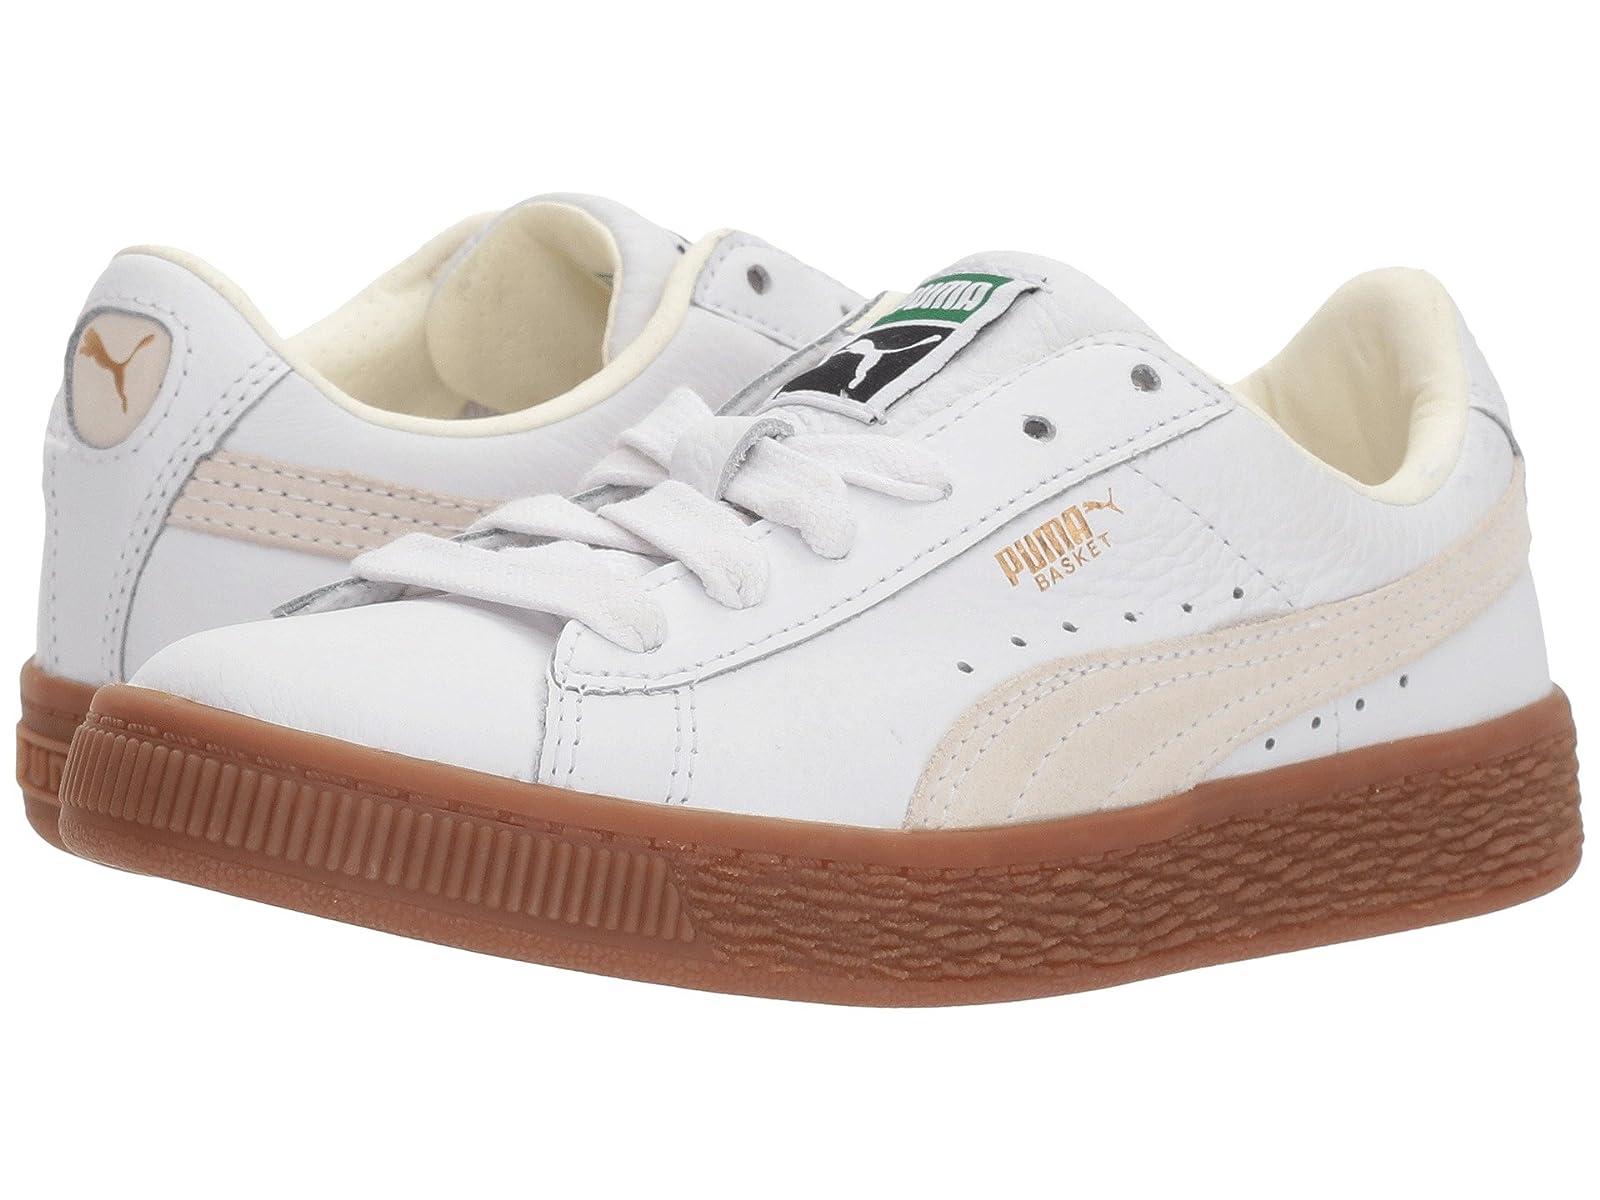 Puma Kids Basket Classic Gum Deluxe (Little Kid)Atmospheric grades have affordable shoes